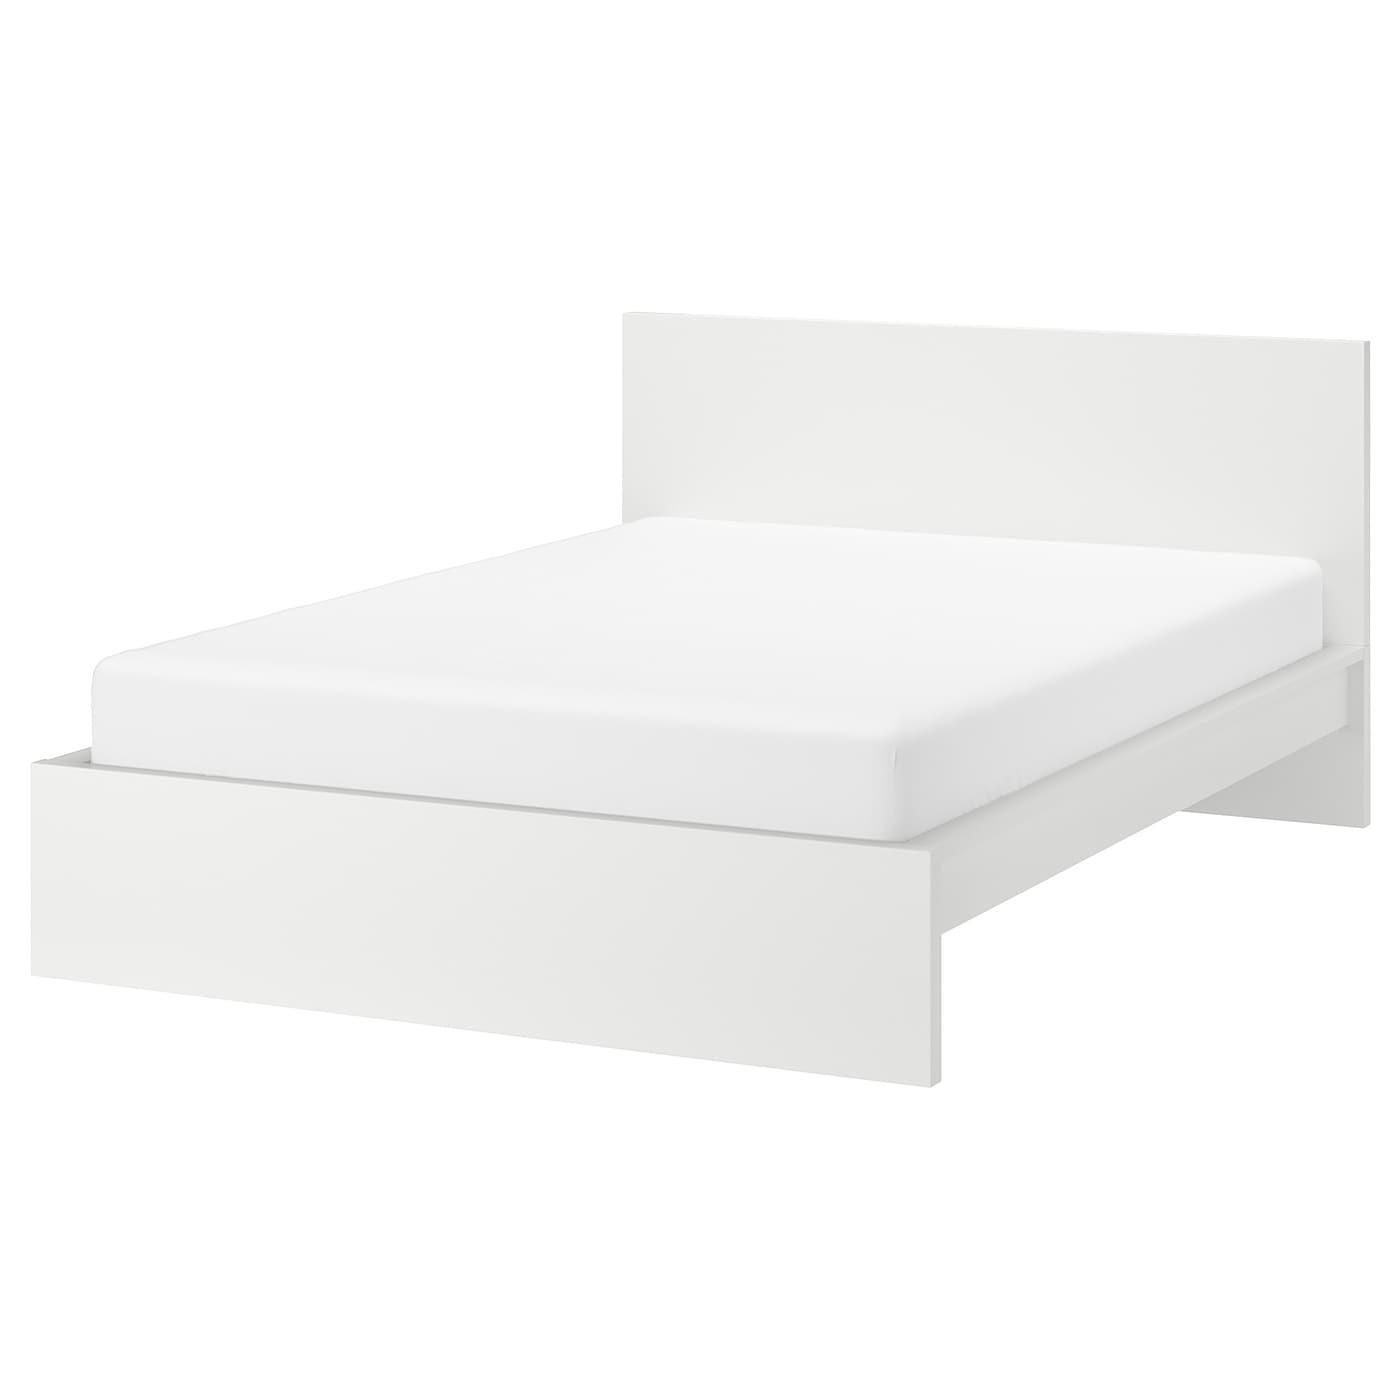 cama malm ikea 1 60 x 2